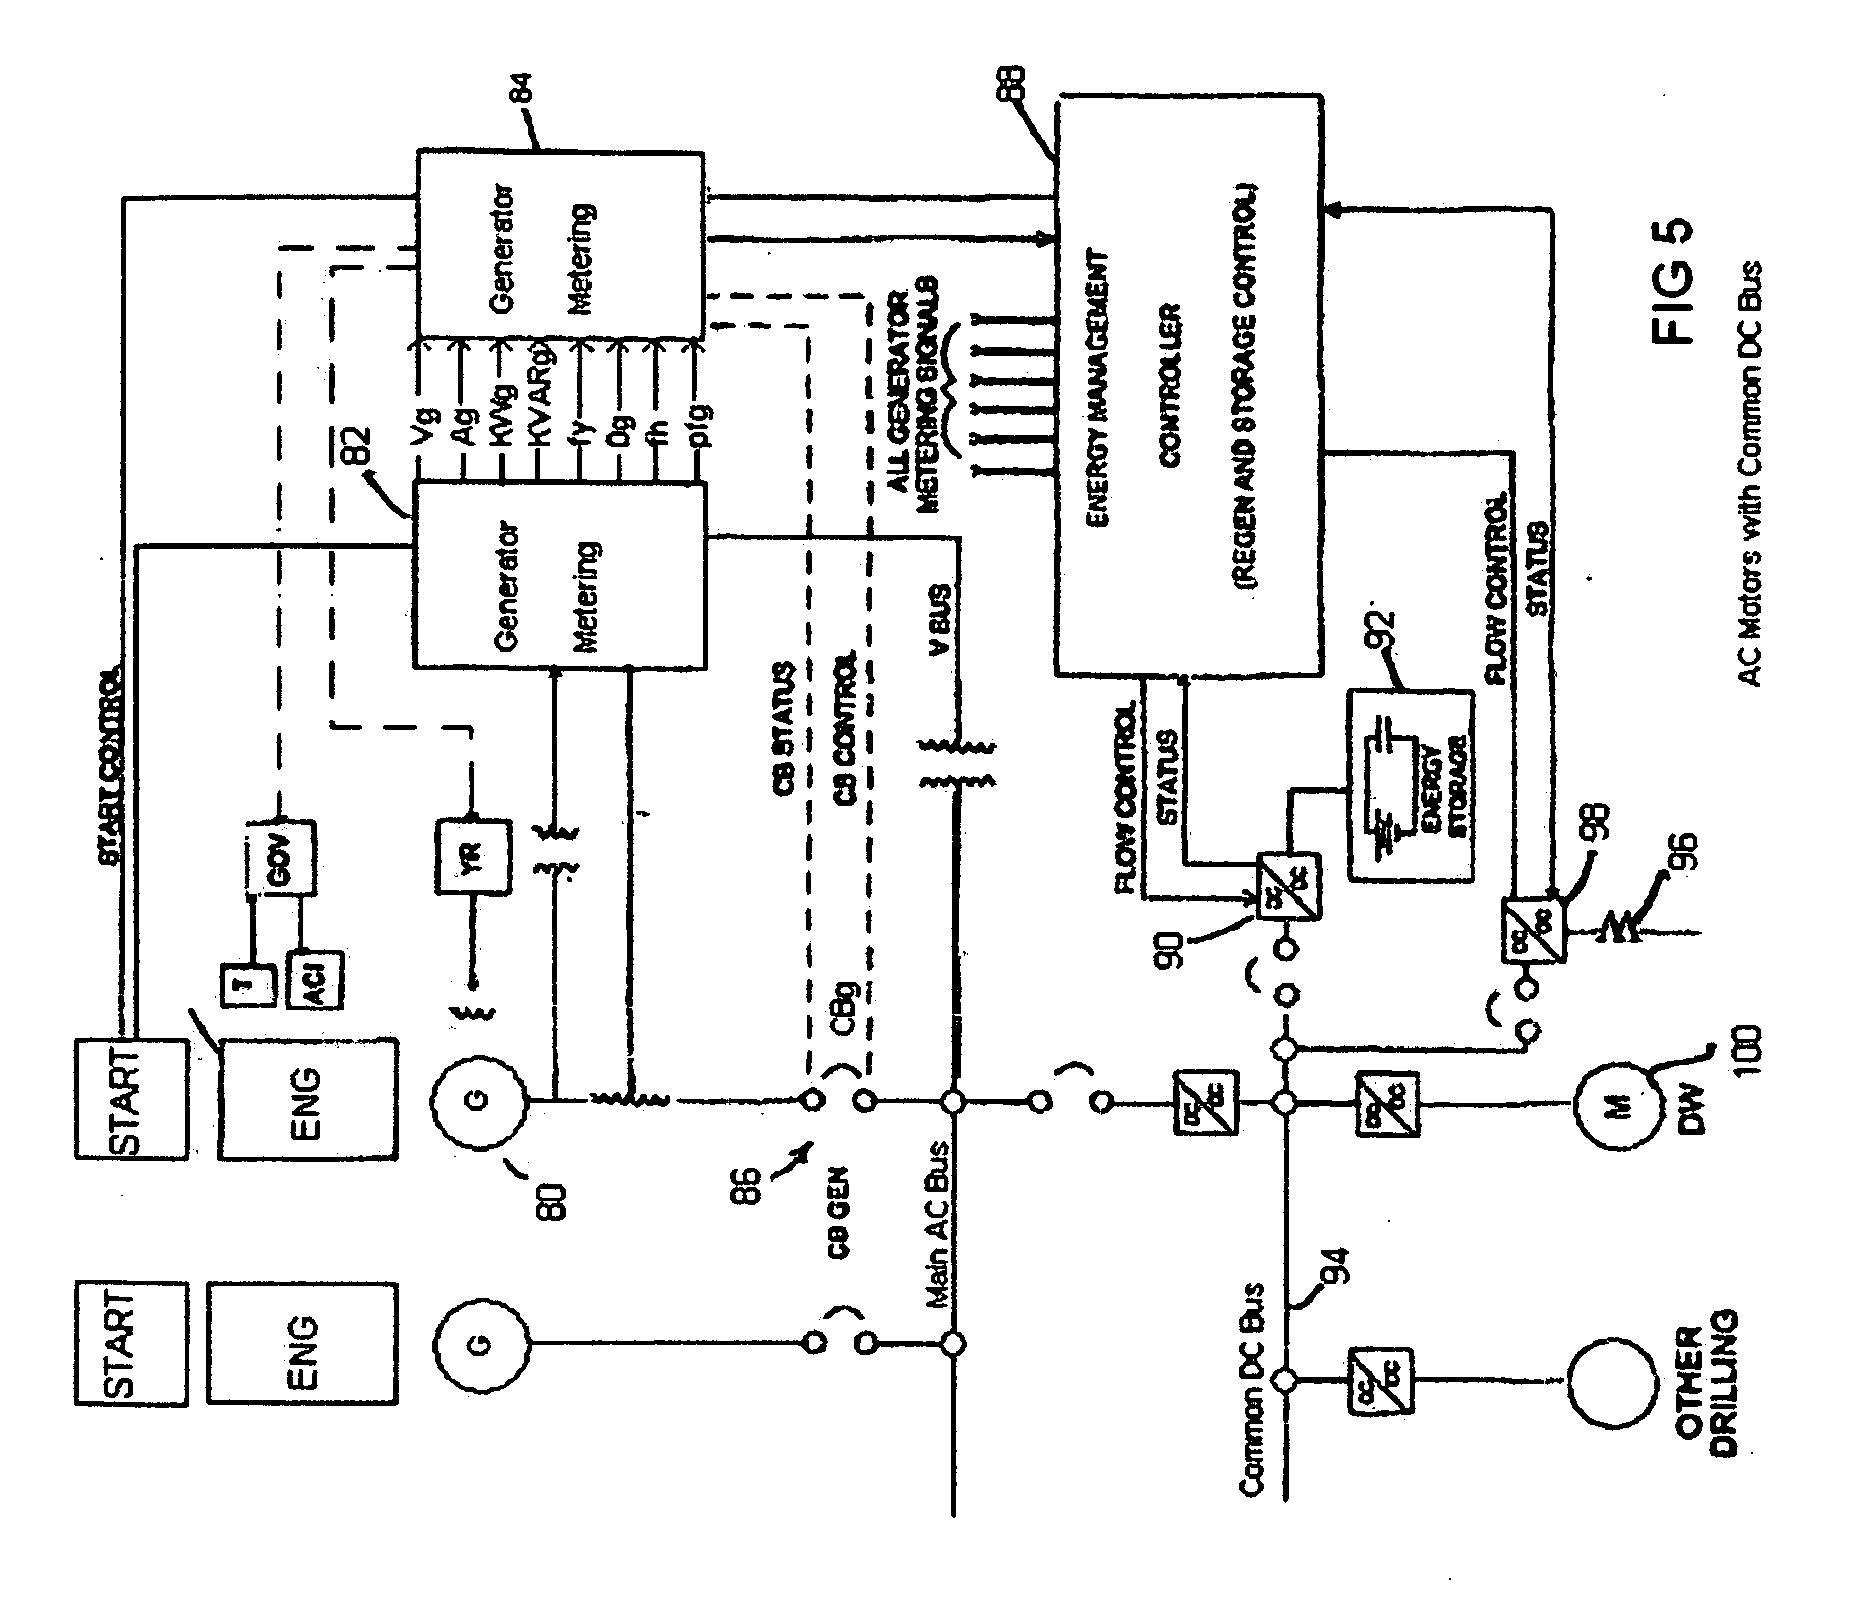 drilling rig power system pdf